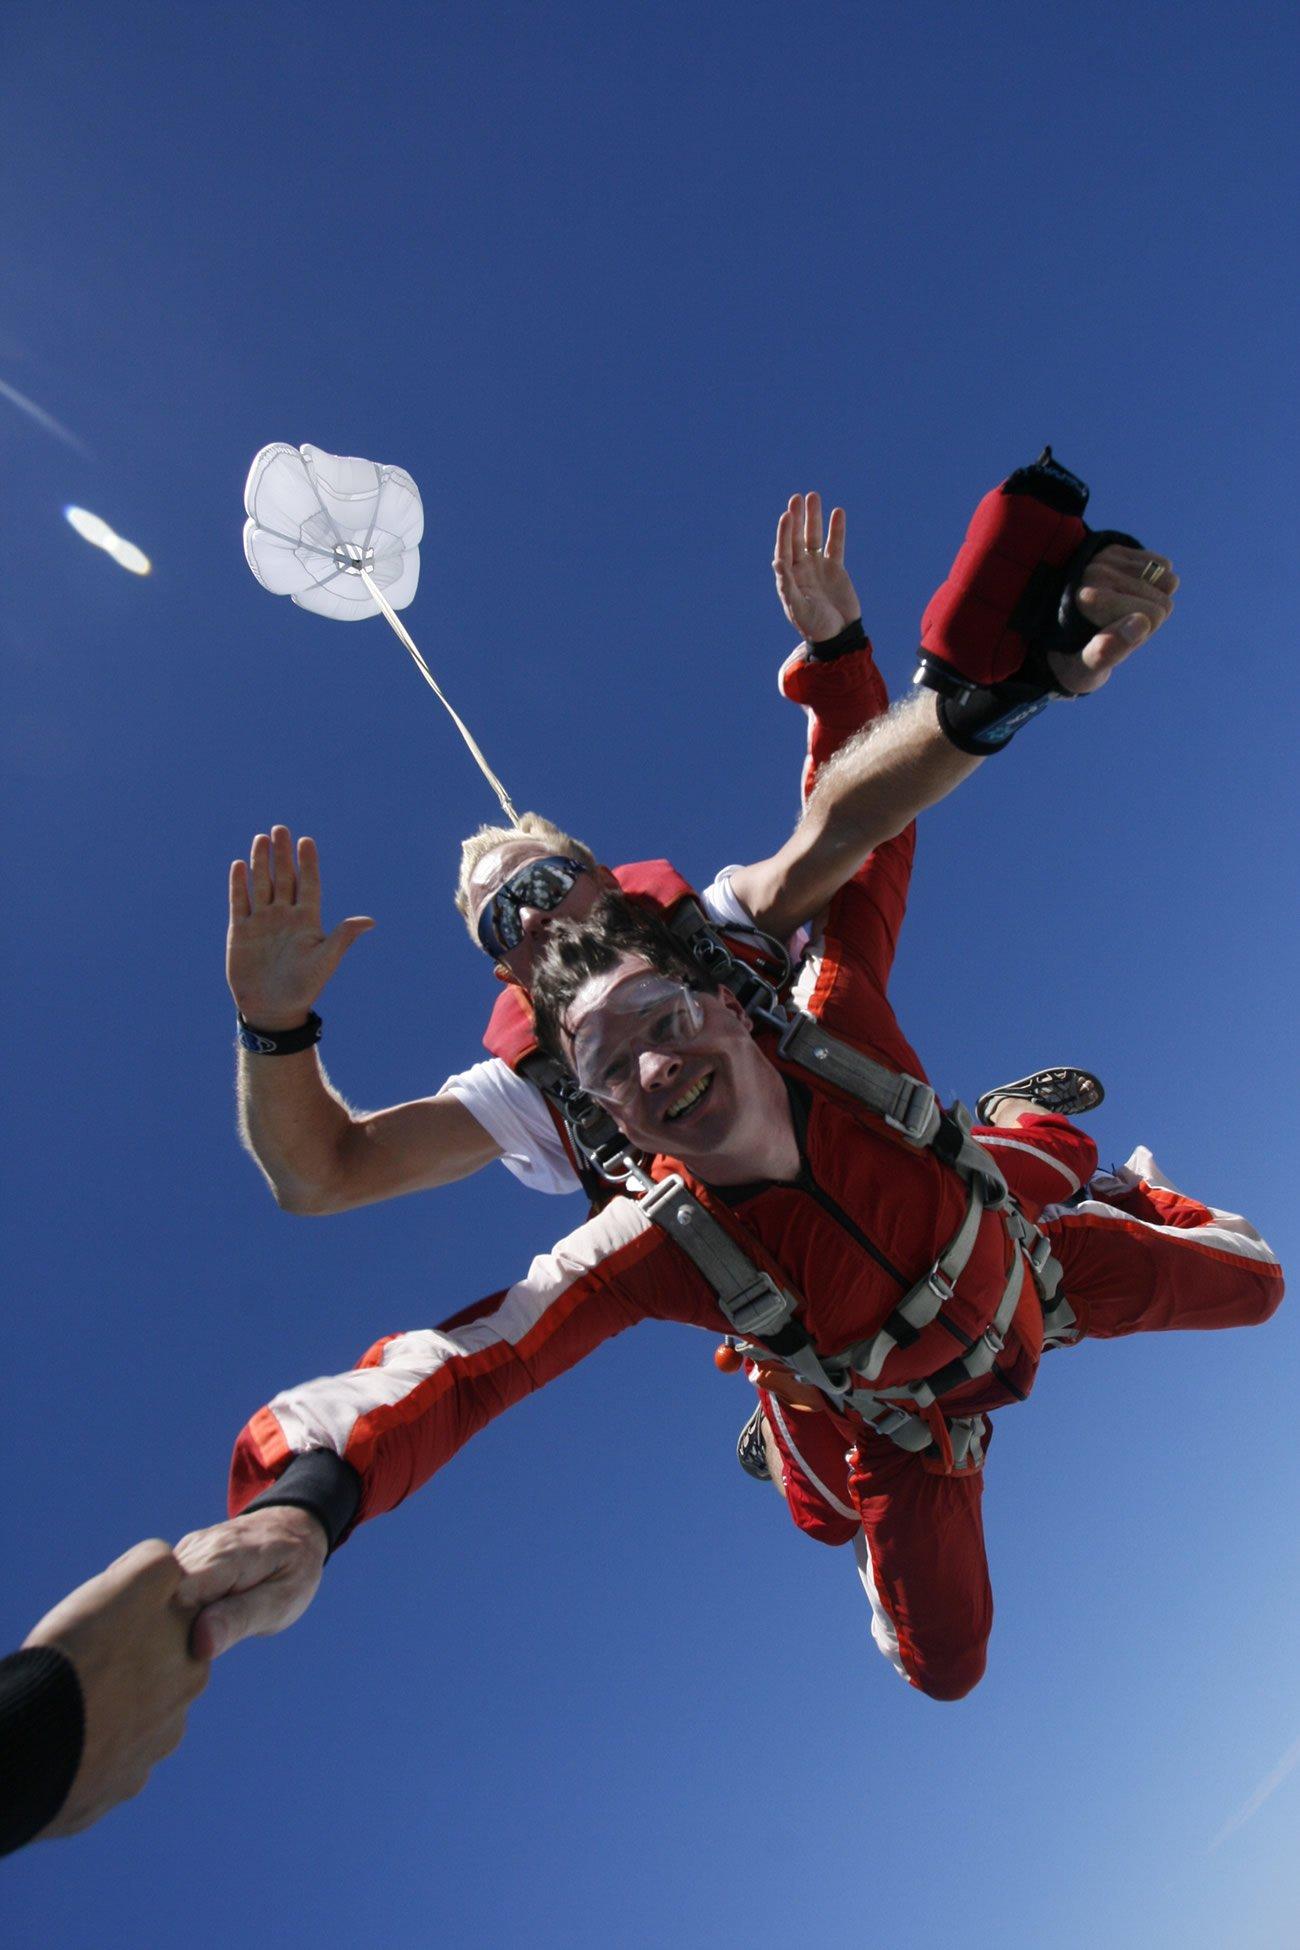 Skydive Tandem Company